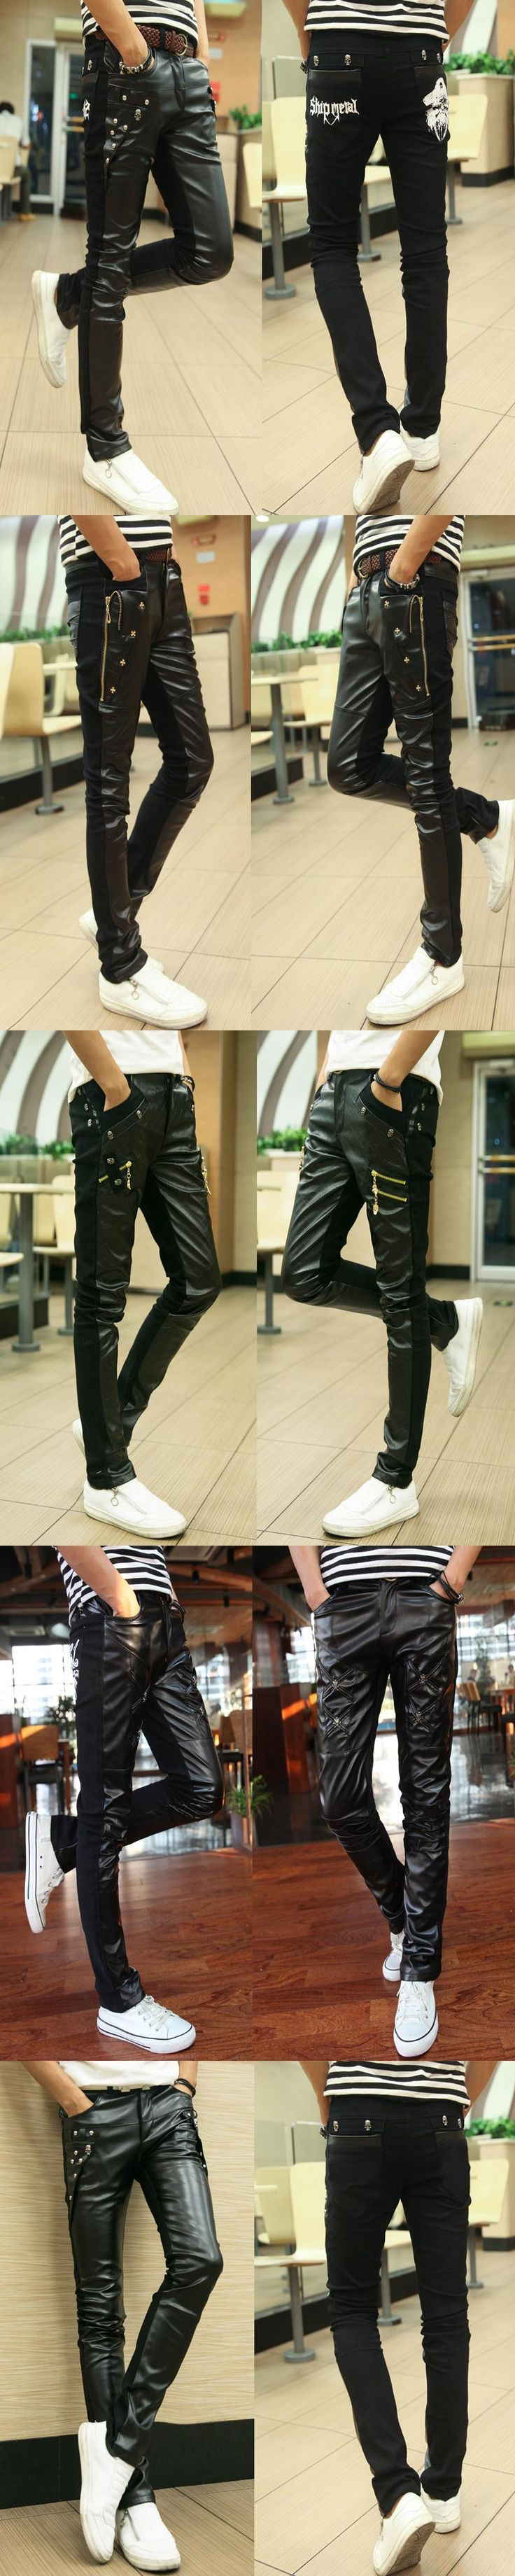 2017 Mens Warm Pants  Camouflage Fashion Men Leather Pants Locomotive Zipper Camo Hip Hop Pants Stitching Slim Fall